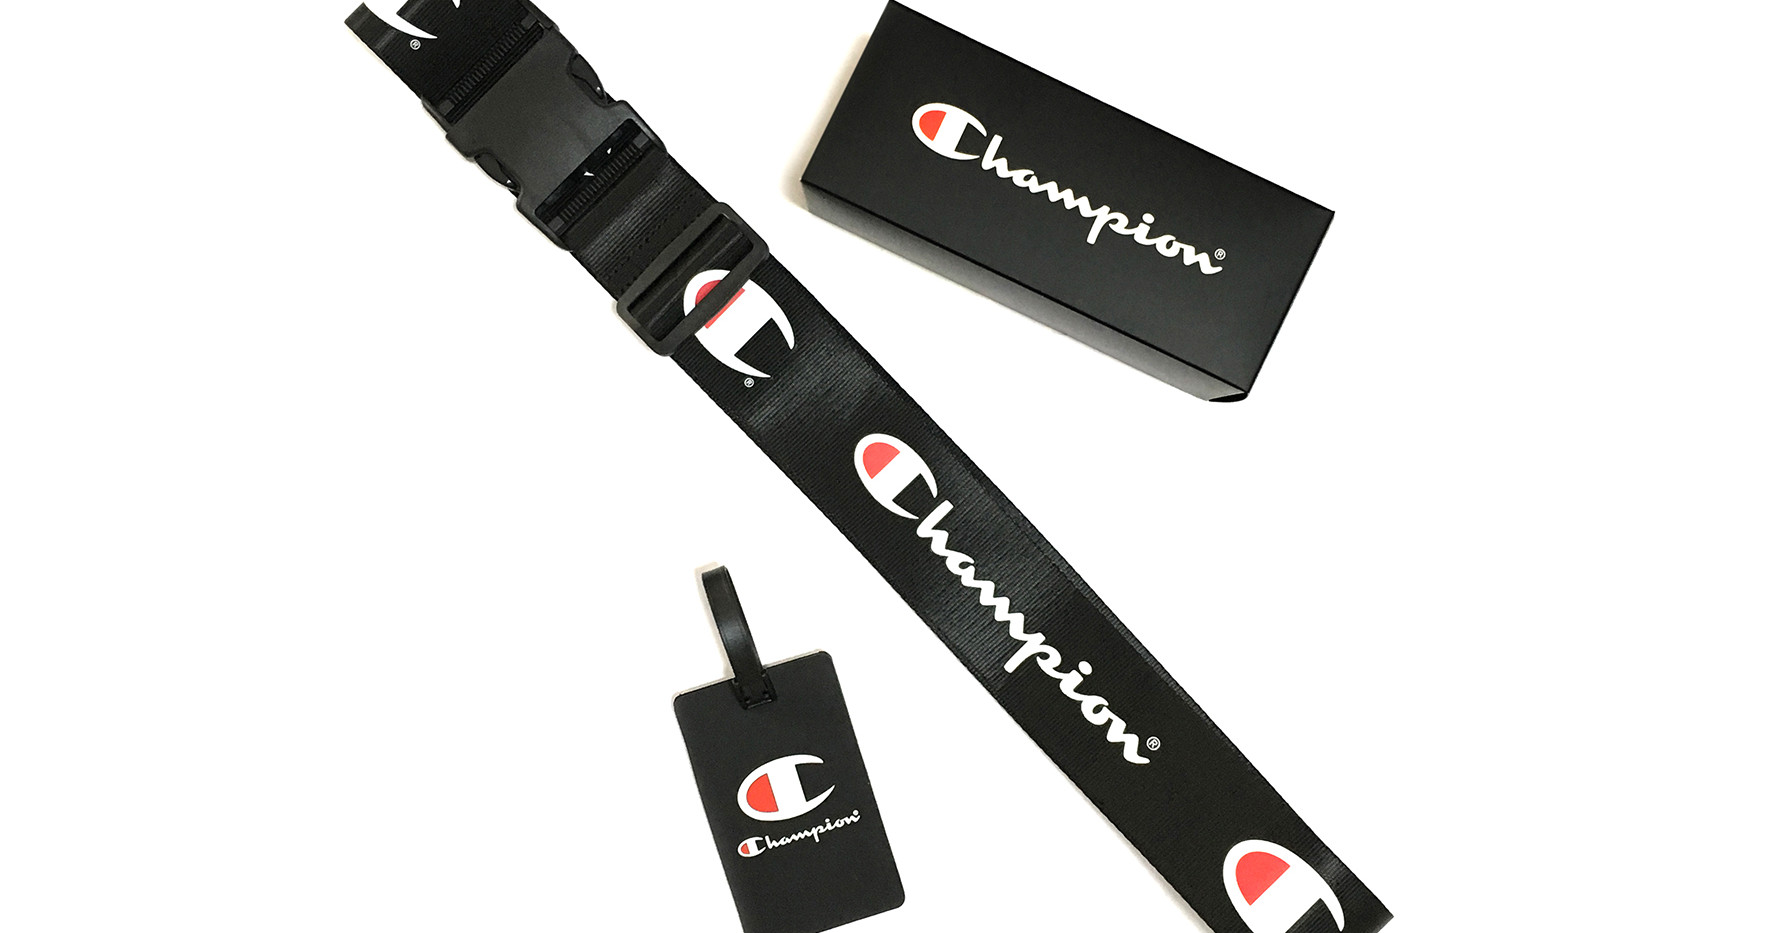 champion lugguage strap_01a.jpg